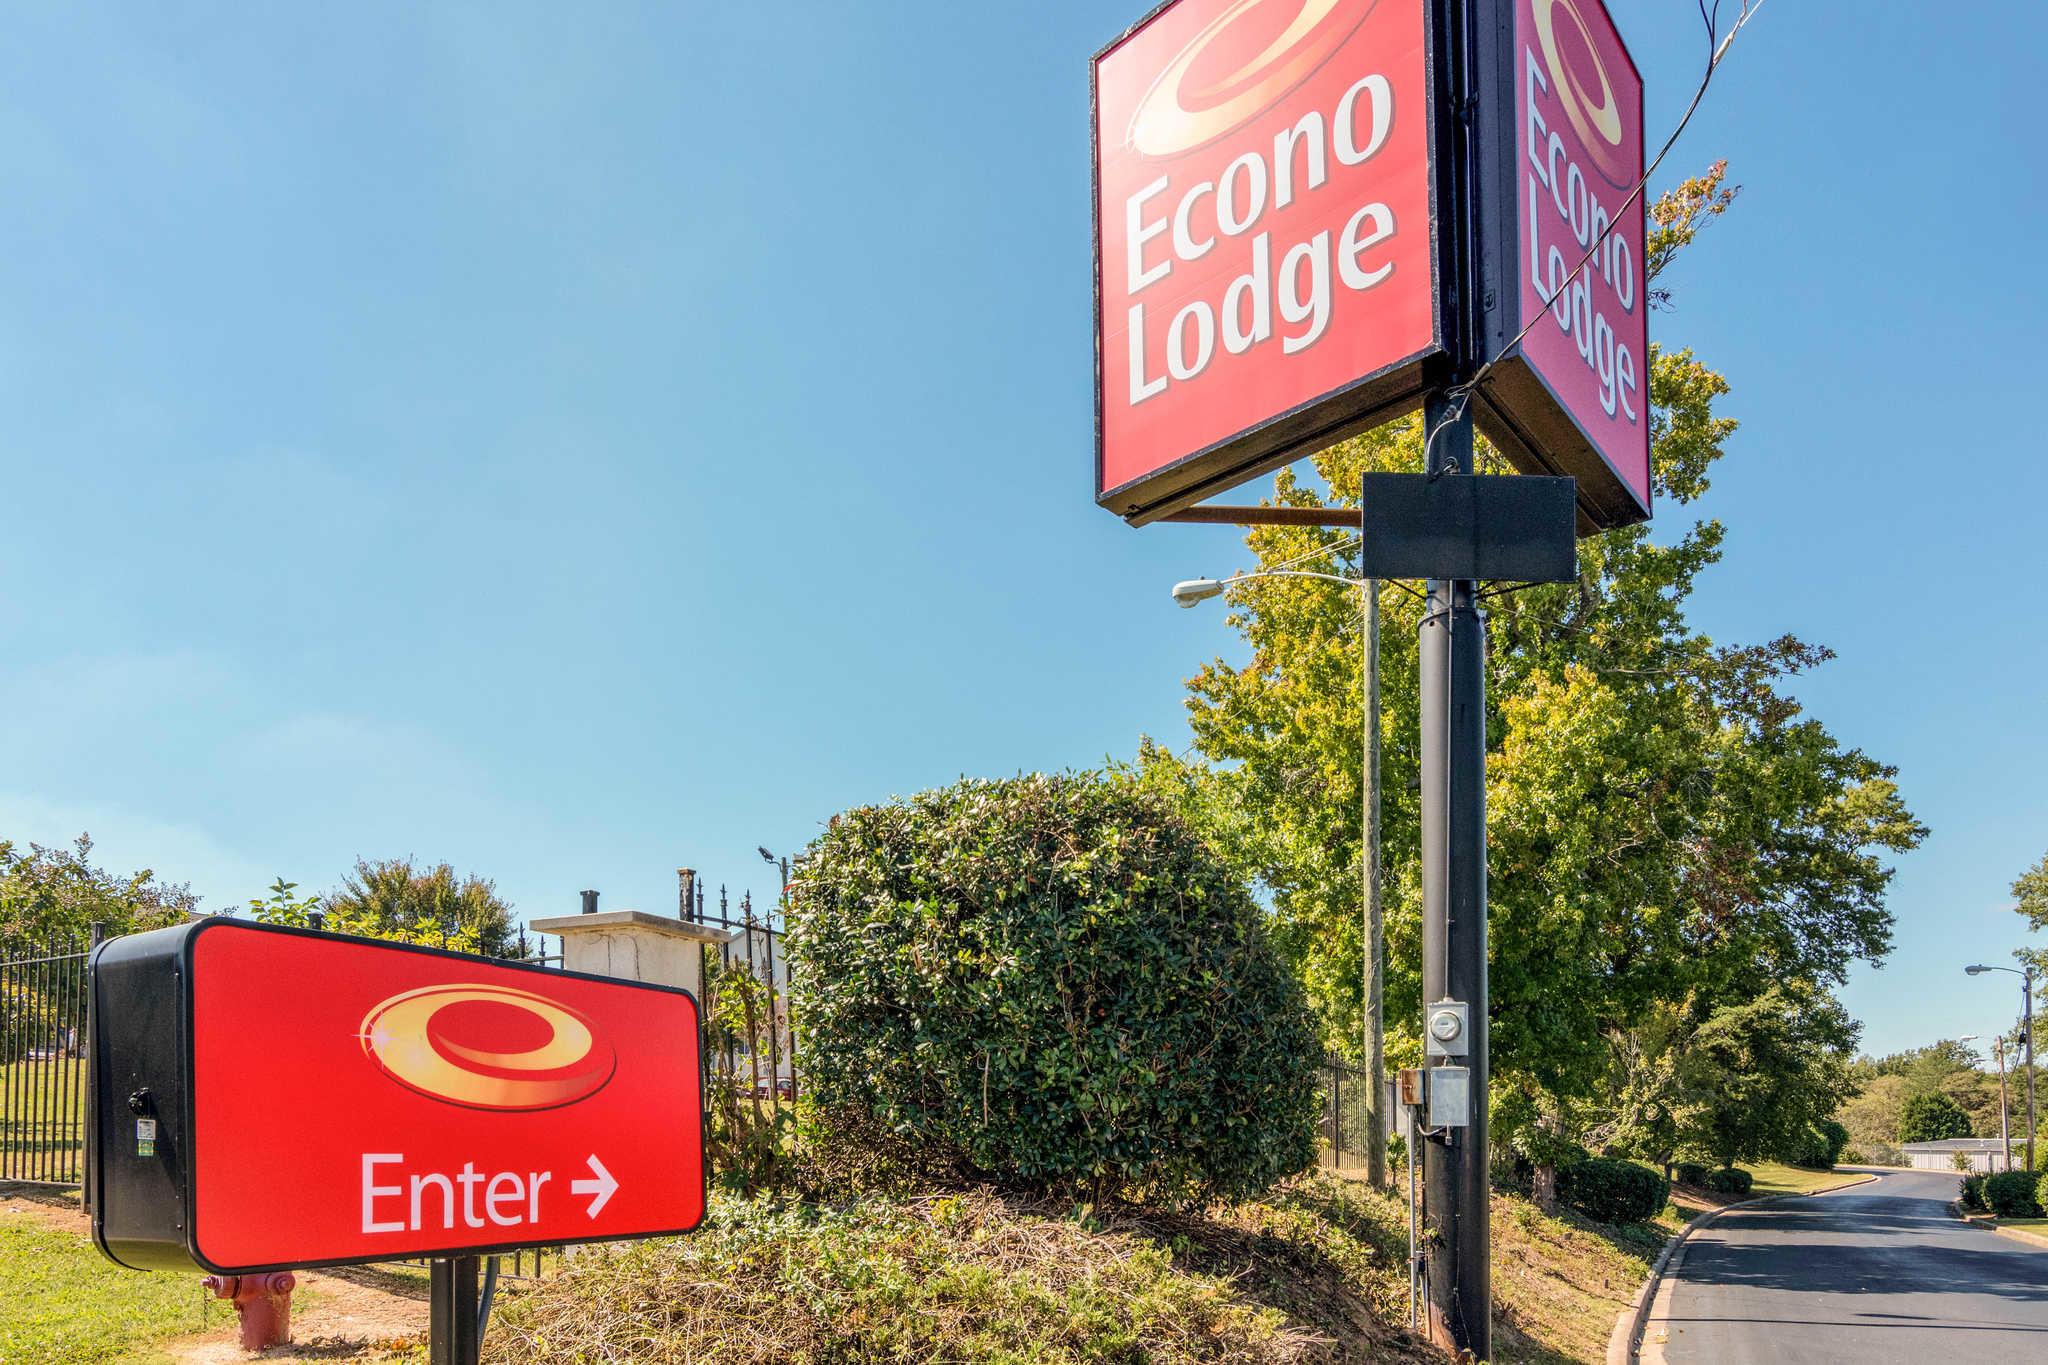 Econo Lodge image 3